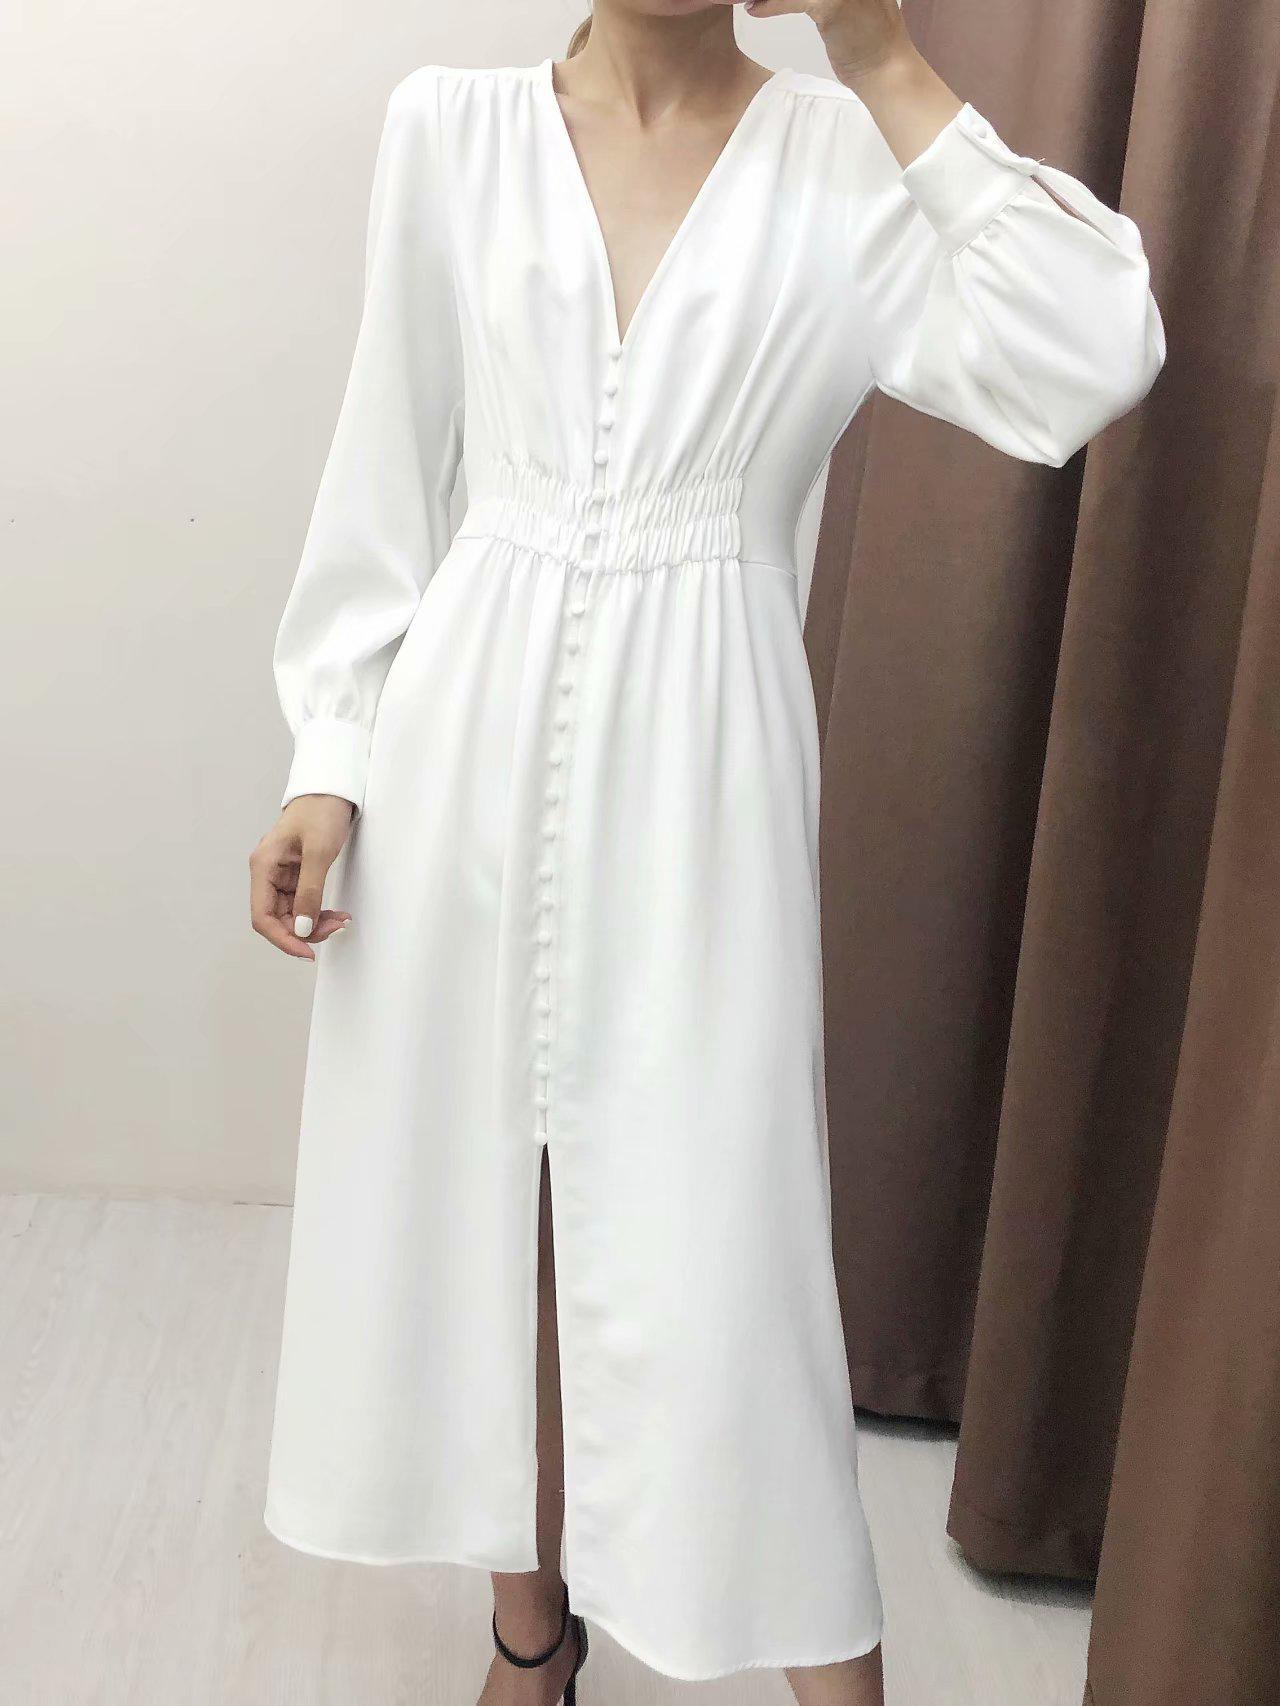 Minimalist V Neck Single-Breasted White Dresses